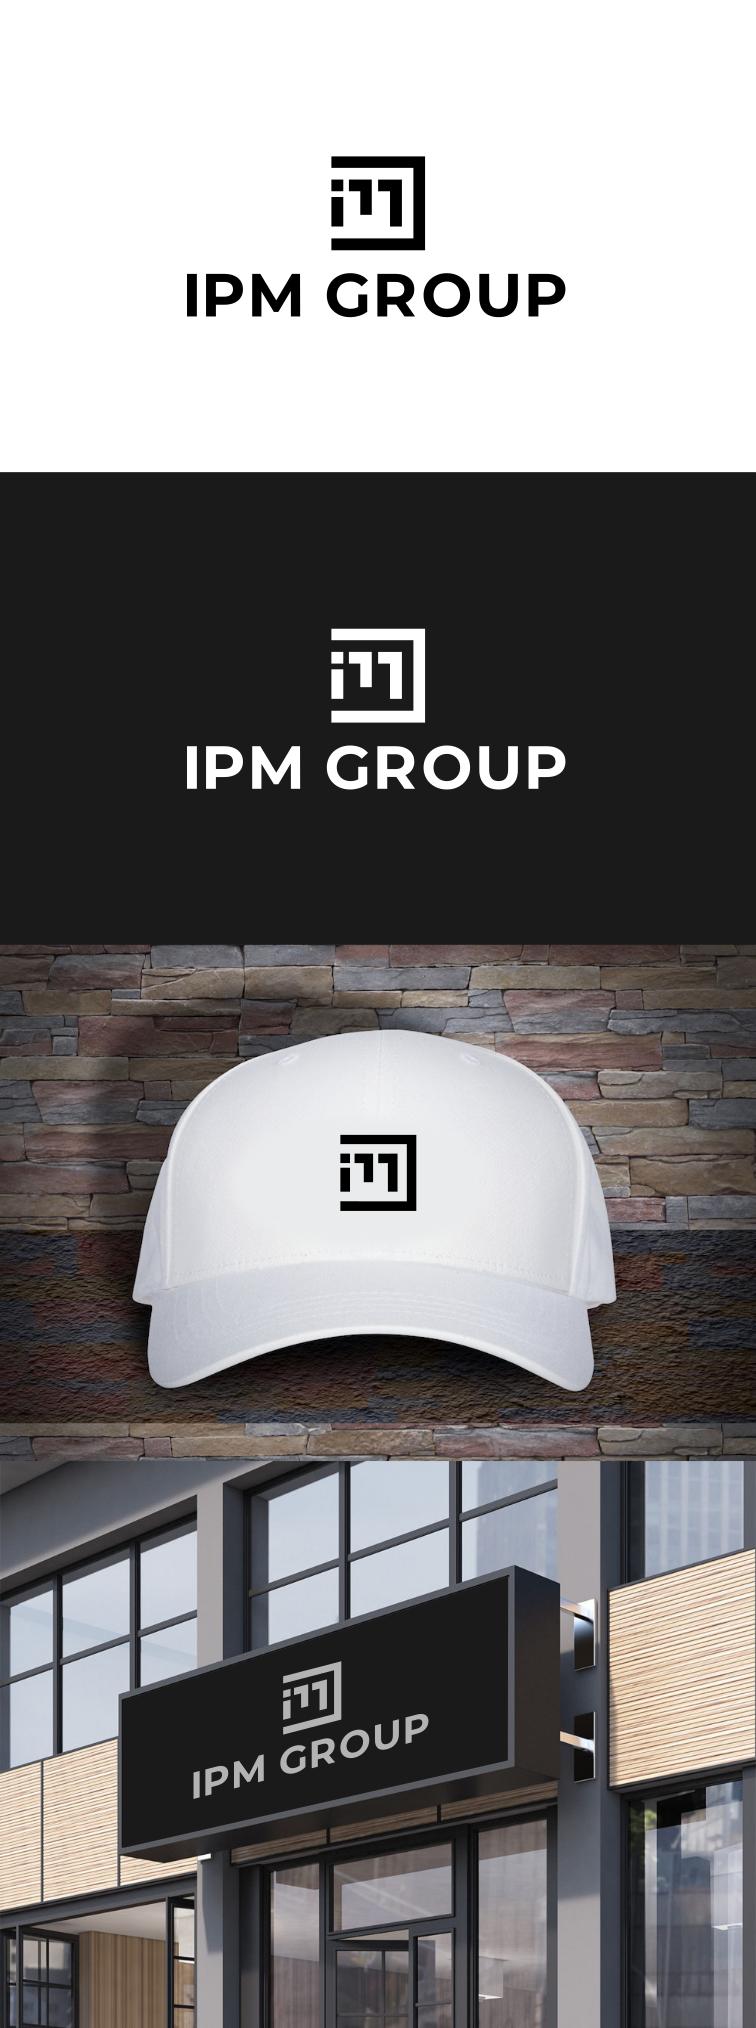 Разработка логотипа для управляющей компании фото f_0995f85703076842.png